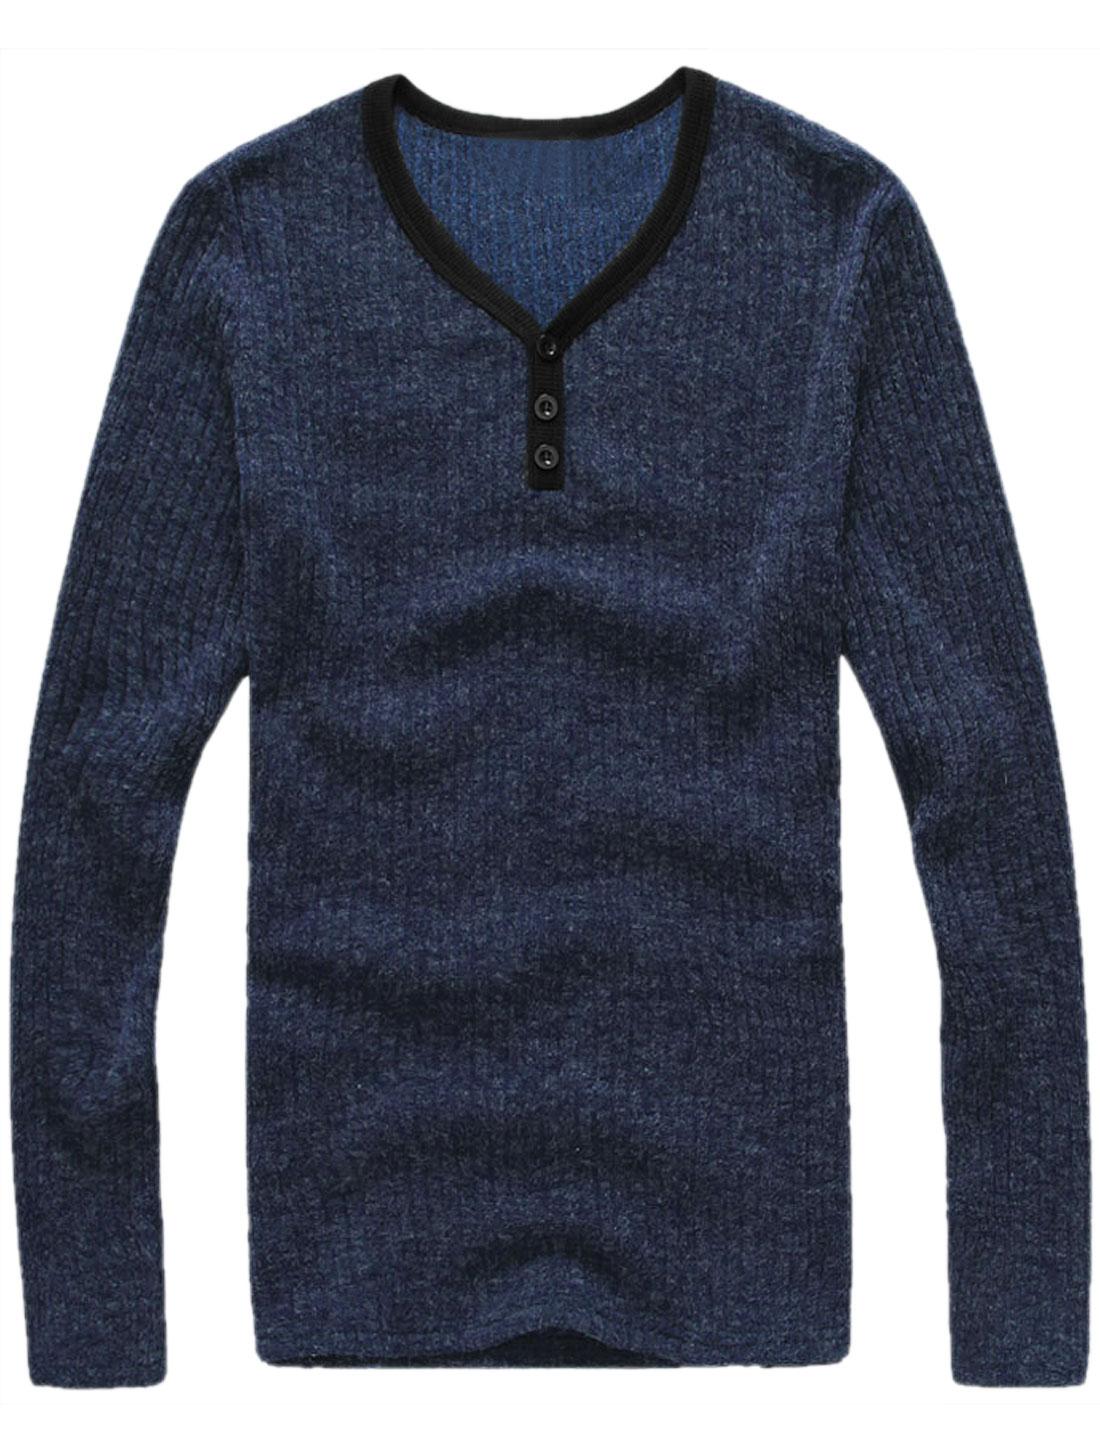 Men Fashion Y Neck Mock Placket Slipover Knit Tee Top Navy Blue M